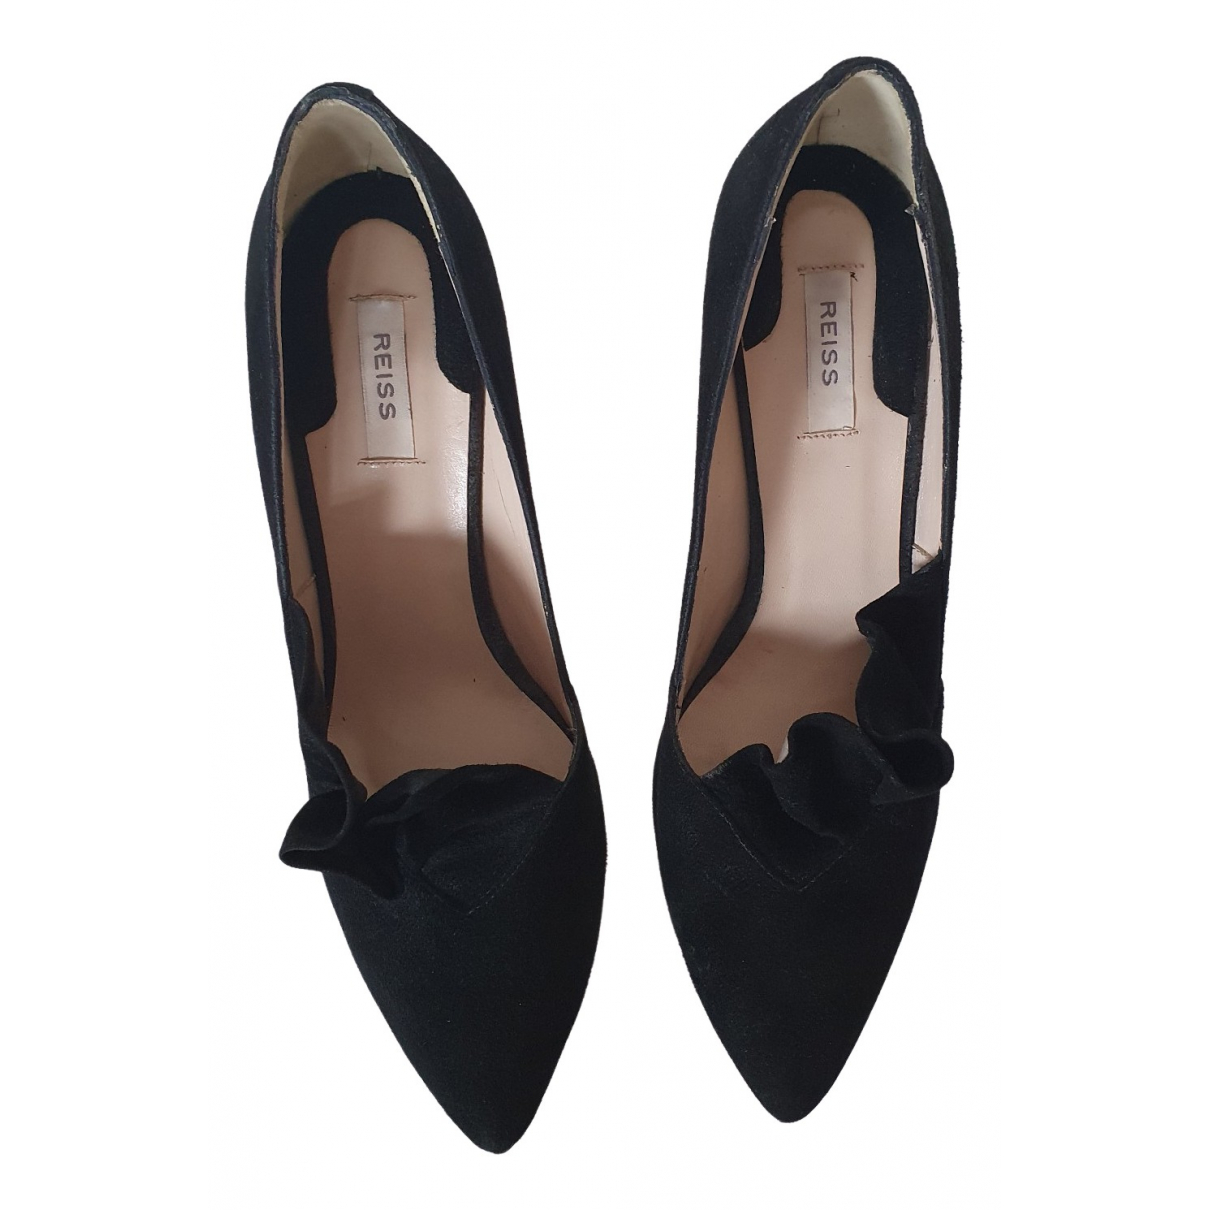 Reiss \N Black Suede Heels for Women 38 EU